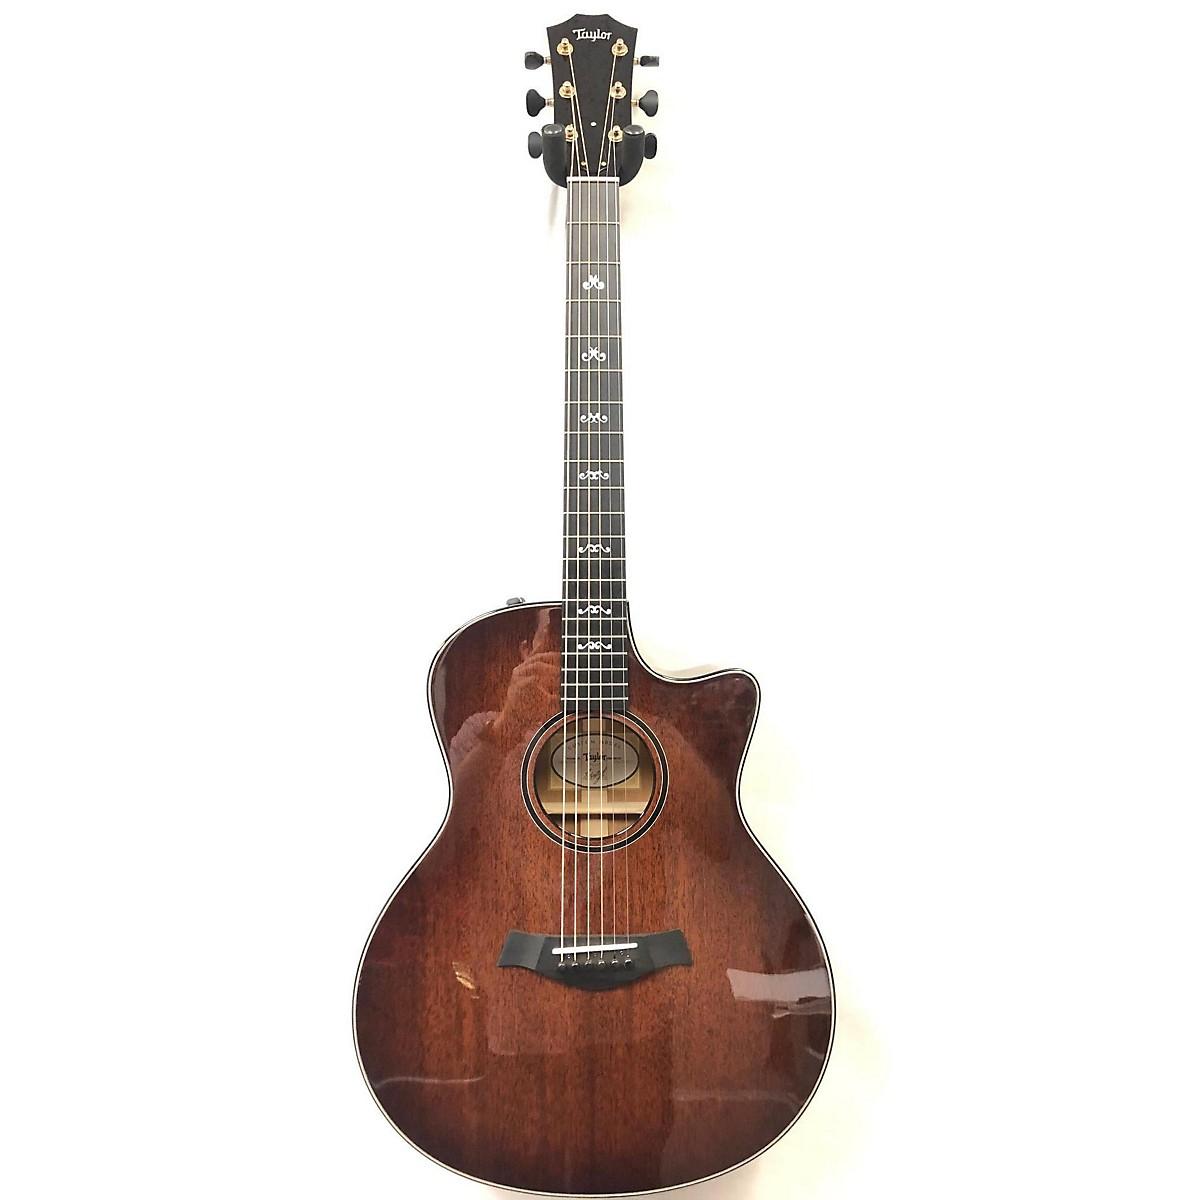 Taylor Custom GS Mahogany Acoustic Electric Guitar